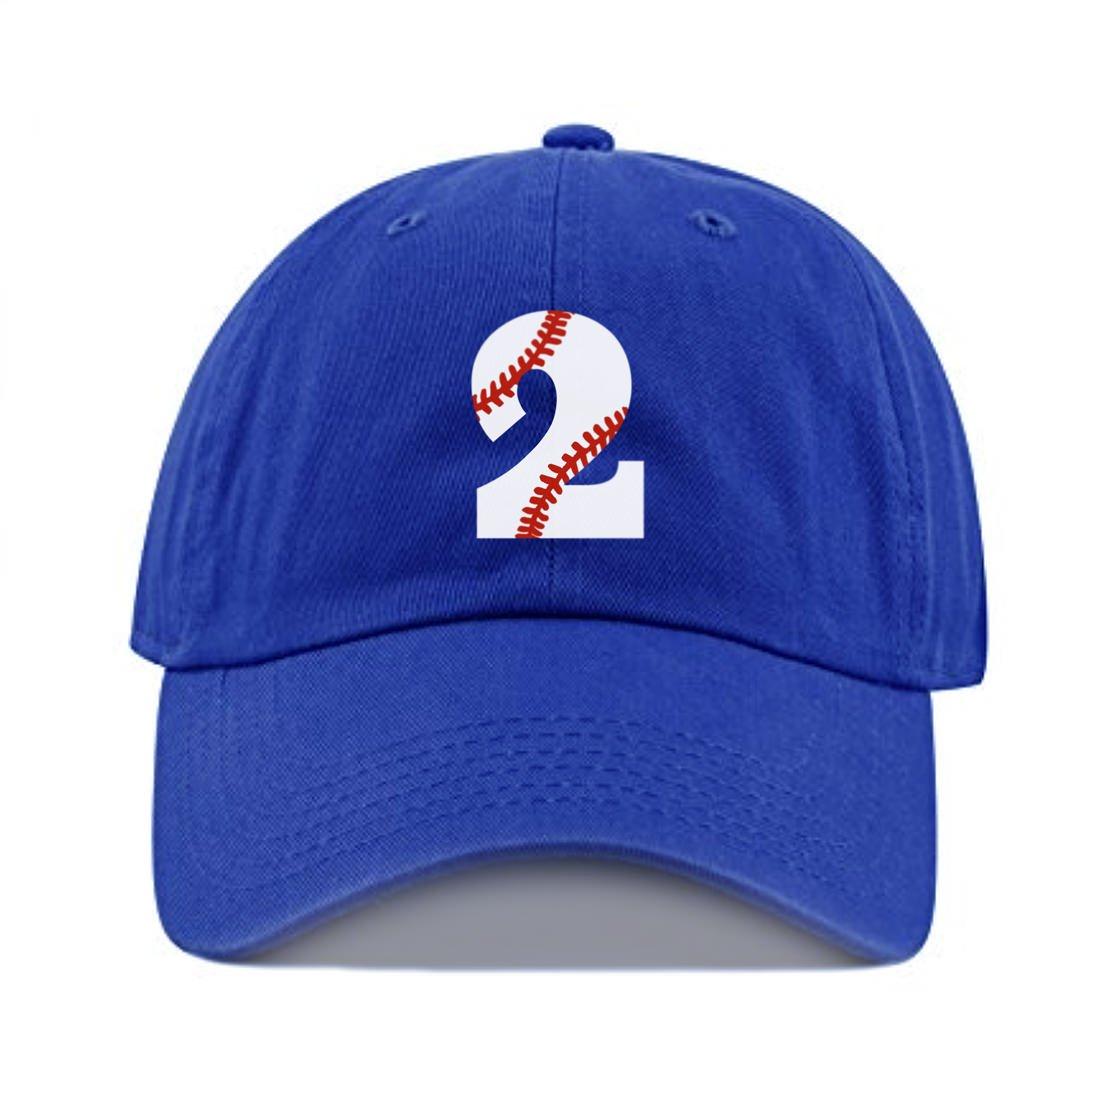 343a6404 Amazon.com: Toddler Baseball Cap Boy or Girl 2nd Birthday Kids Hat Baseball  2 Sports Hat Two Bday Tee Ball: Clothing